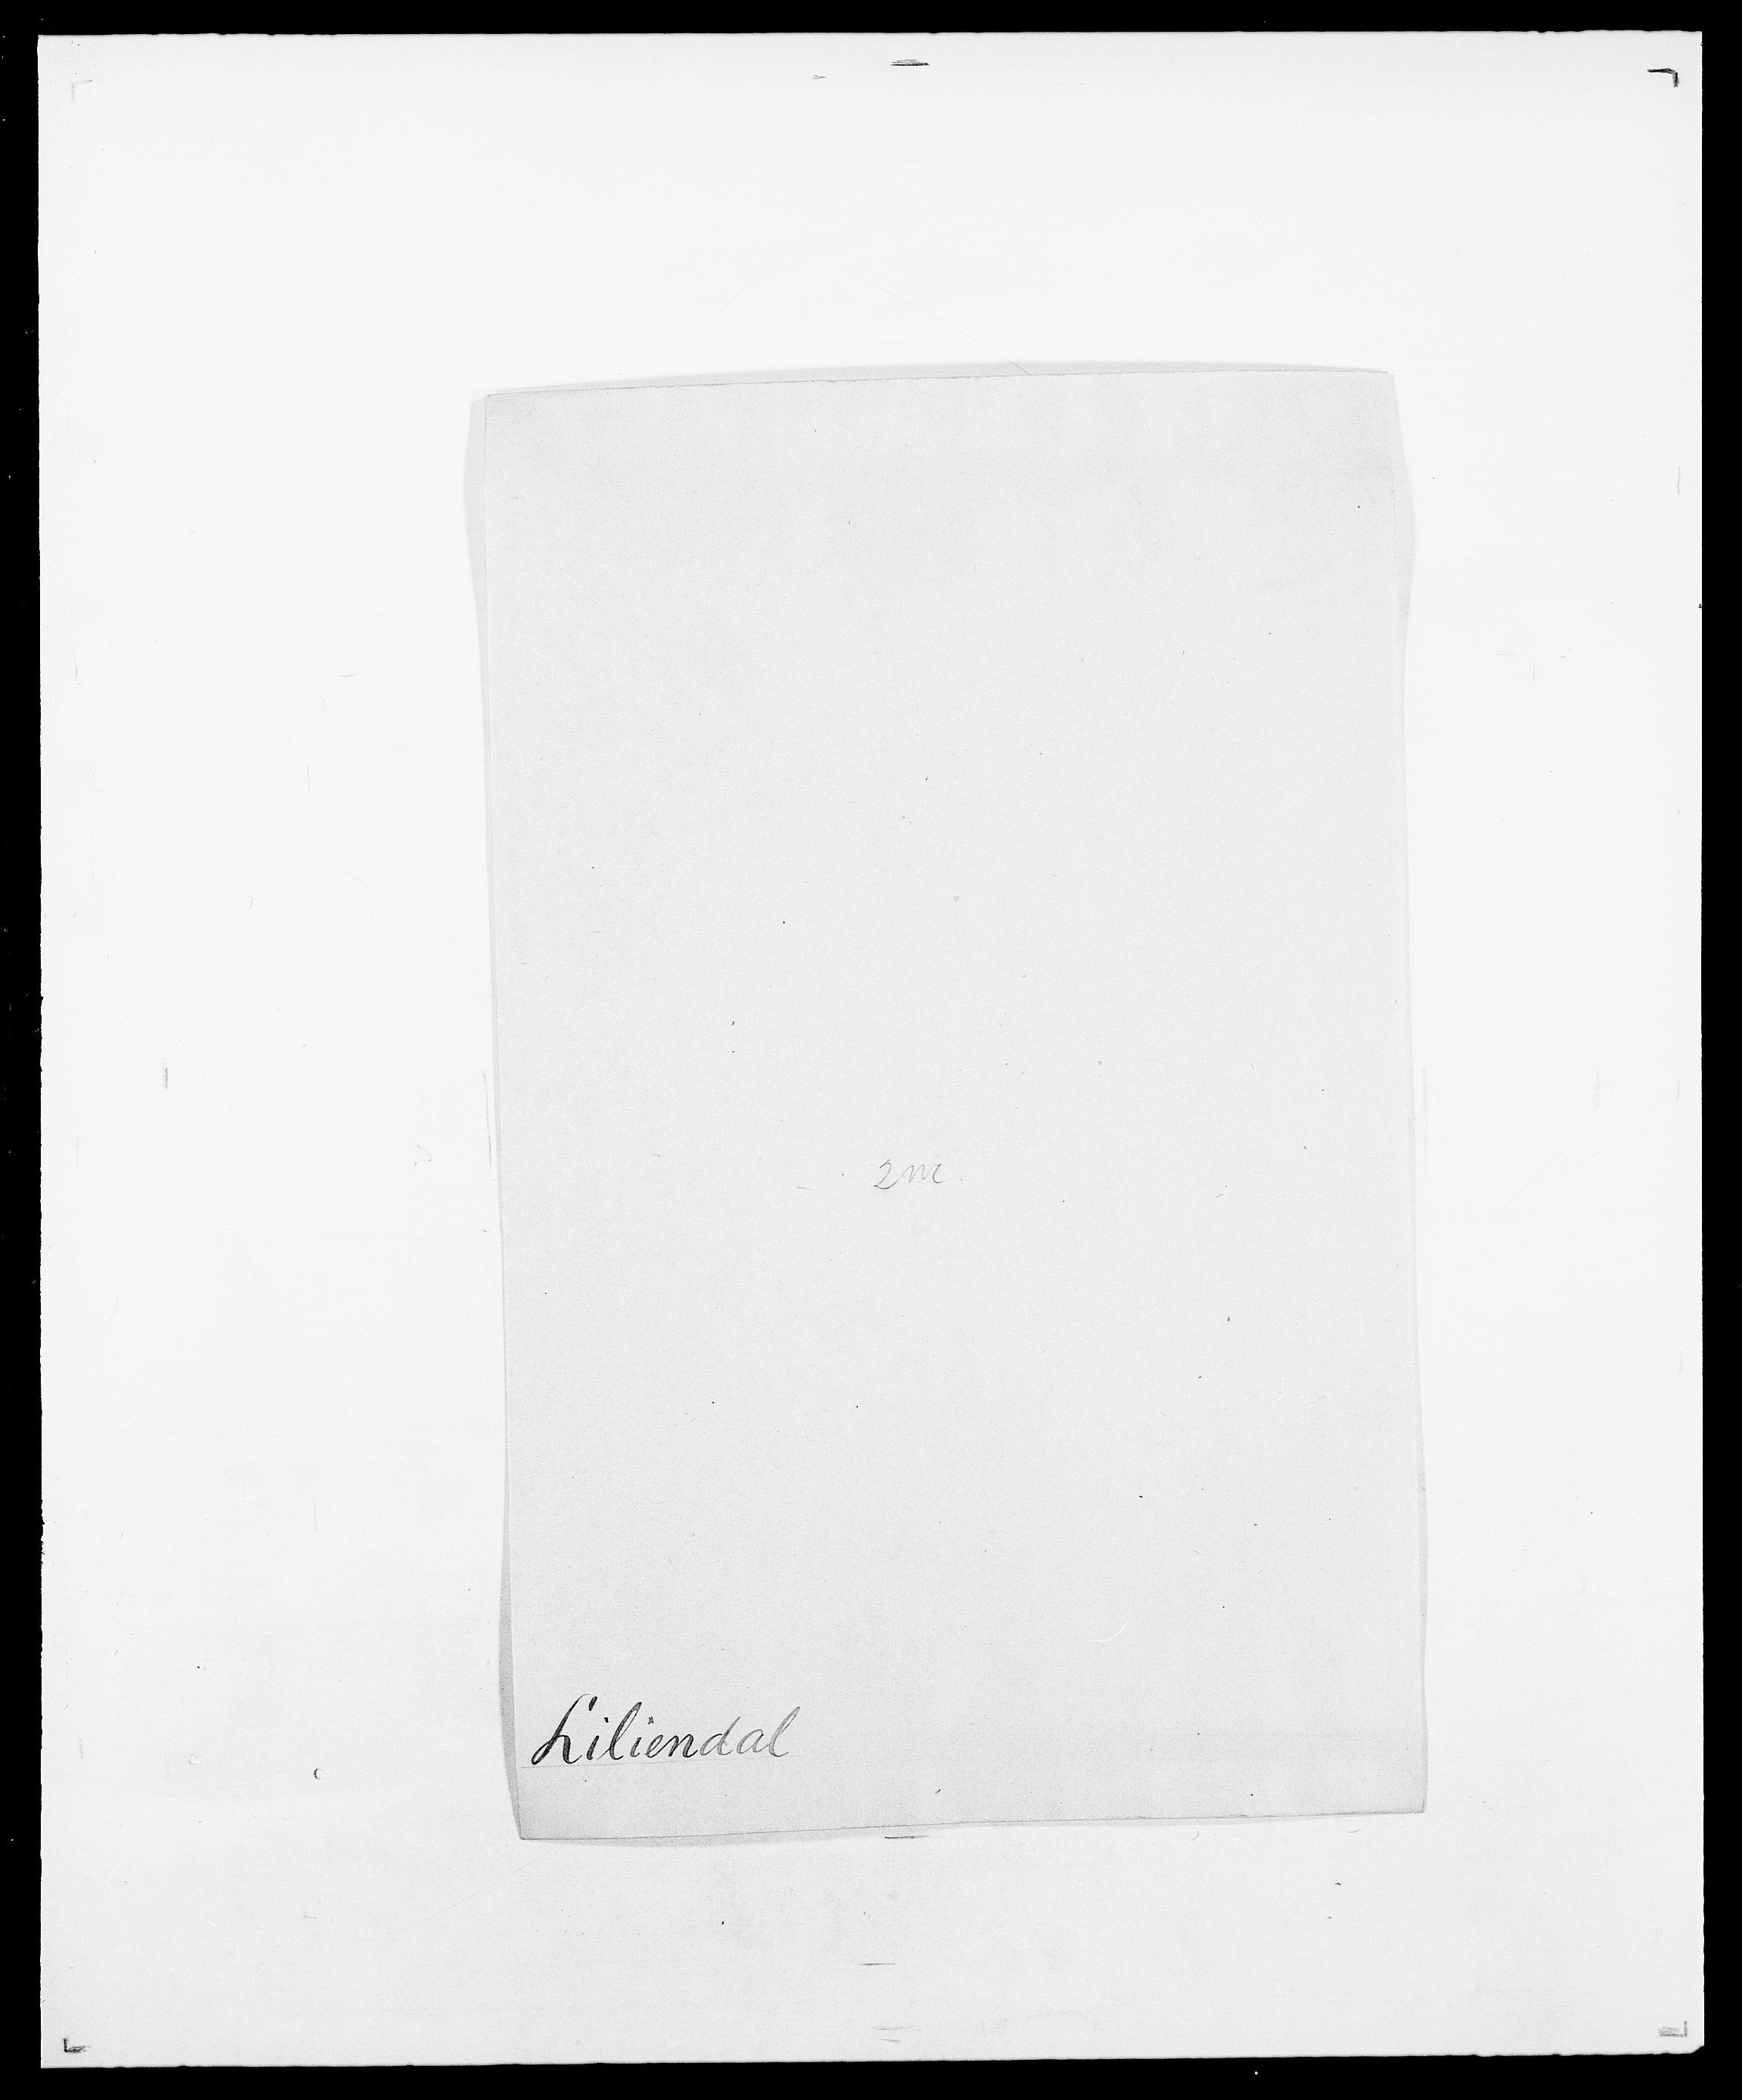 SAO, Delgobe, Charles Antoine - samling, D/Da/L0023: Lau - Lirvyn, s. 400